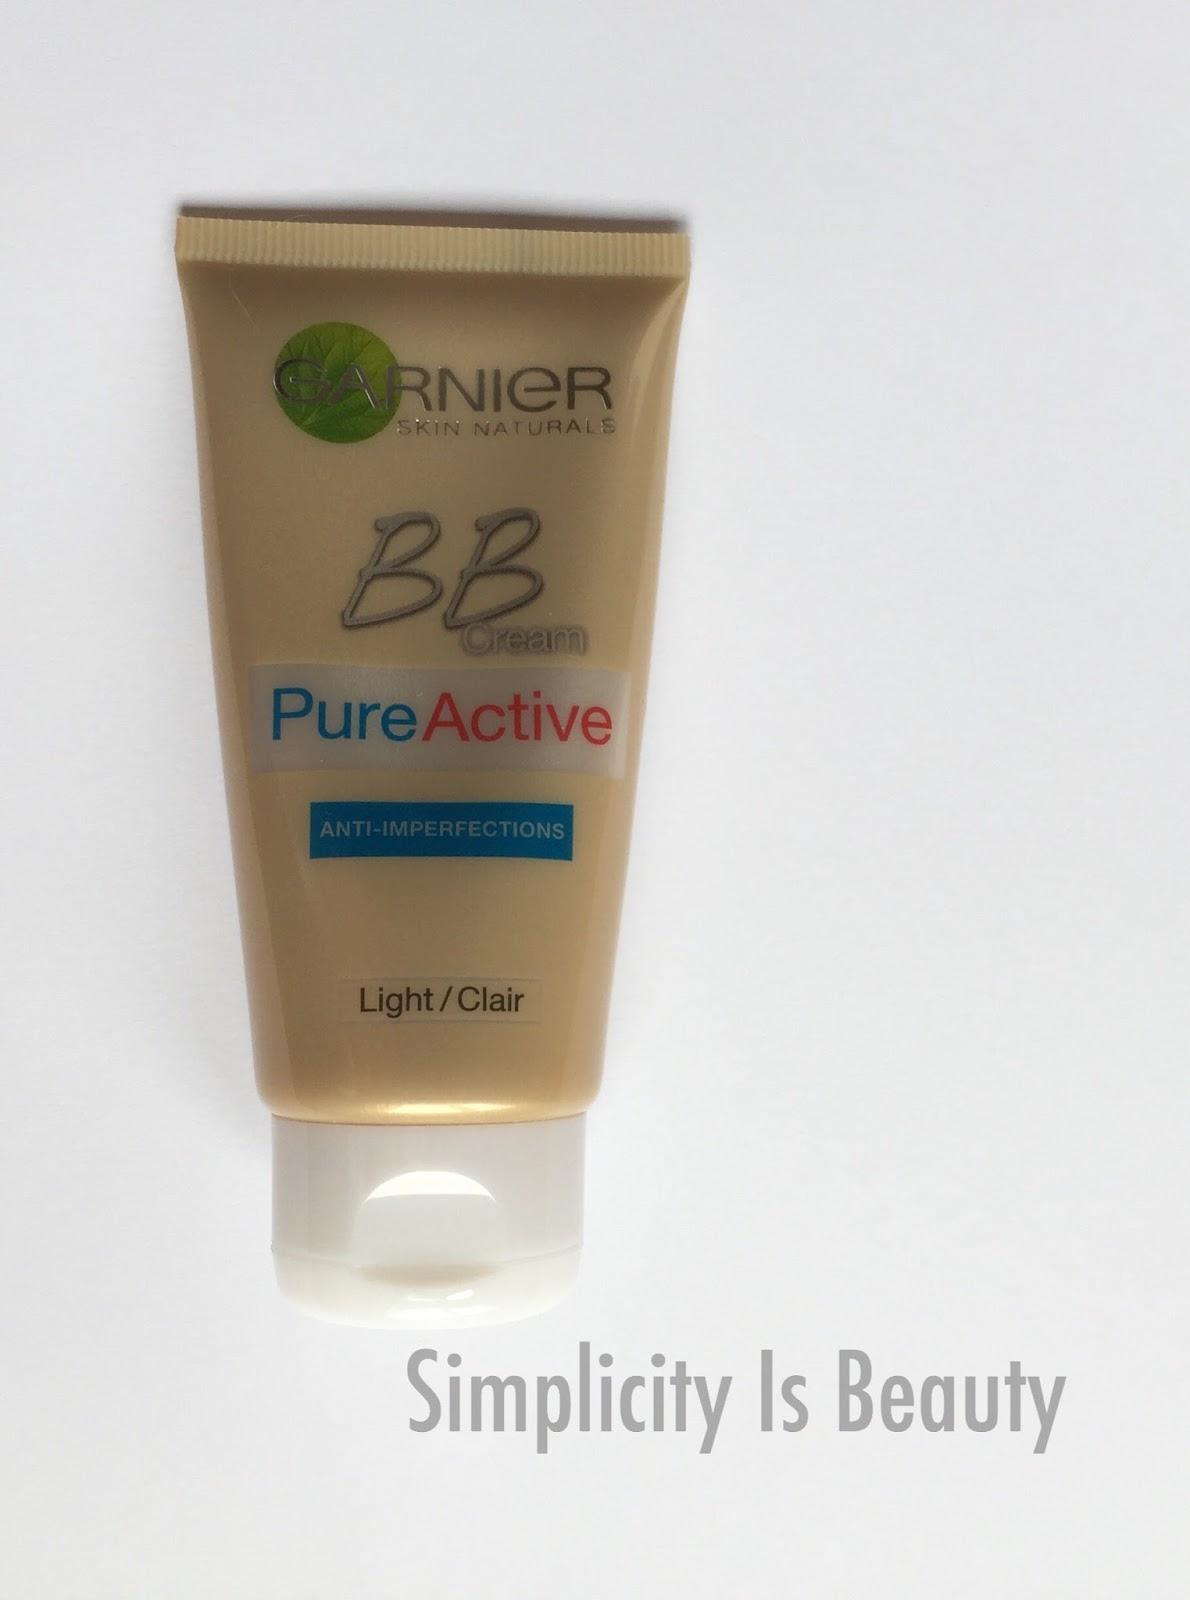 Hanae Beauty رييفيو بي بي كريم غارنييه بيور اكتيف Garnier Bb Cream Pure Active